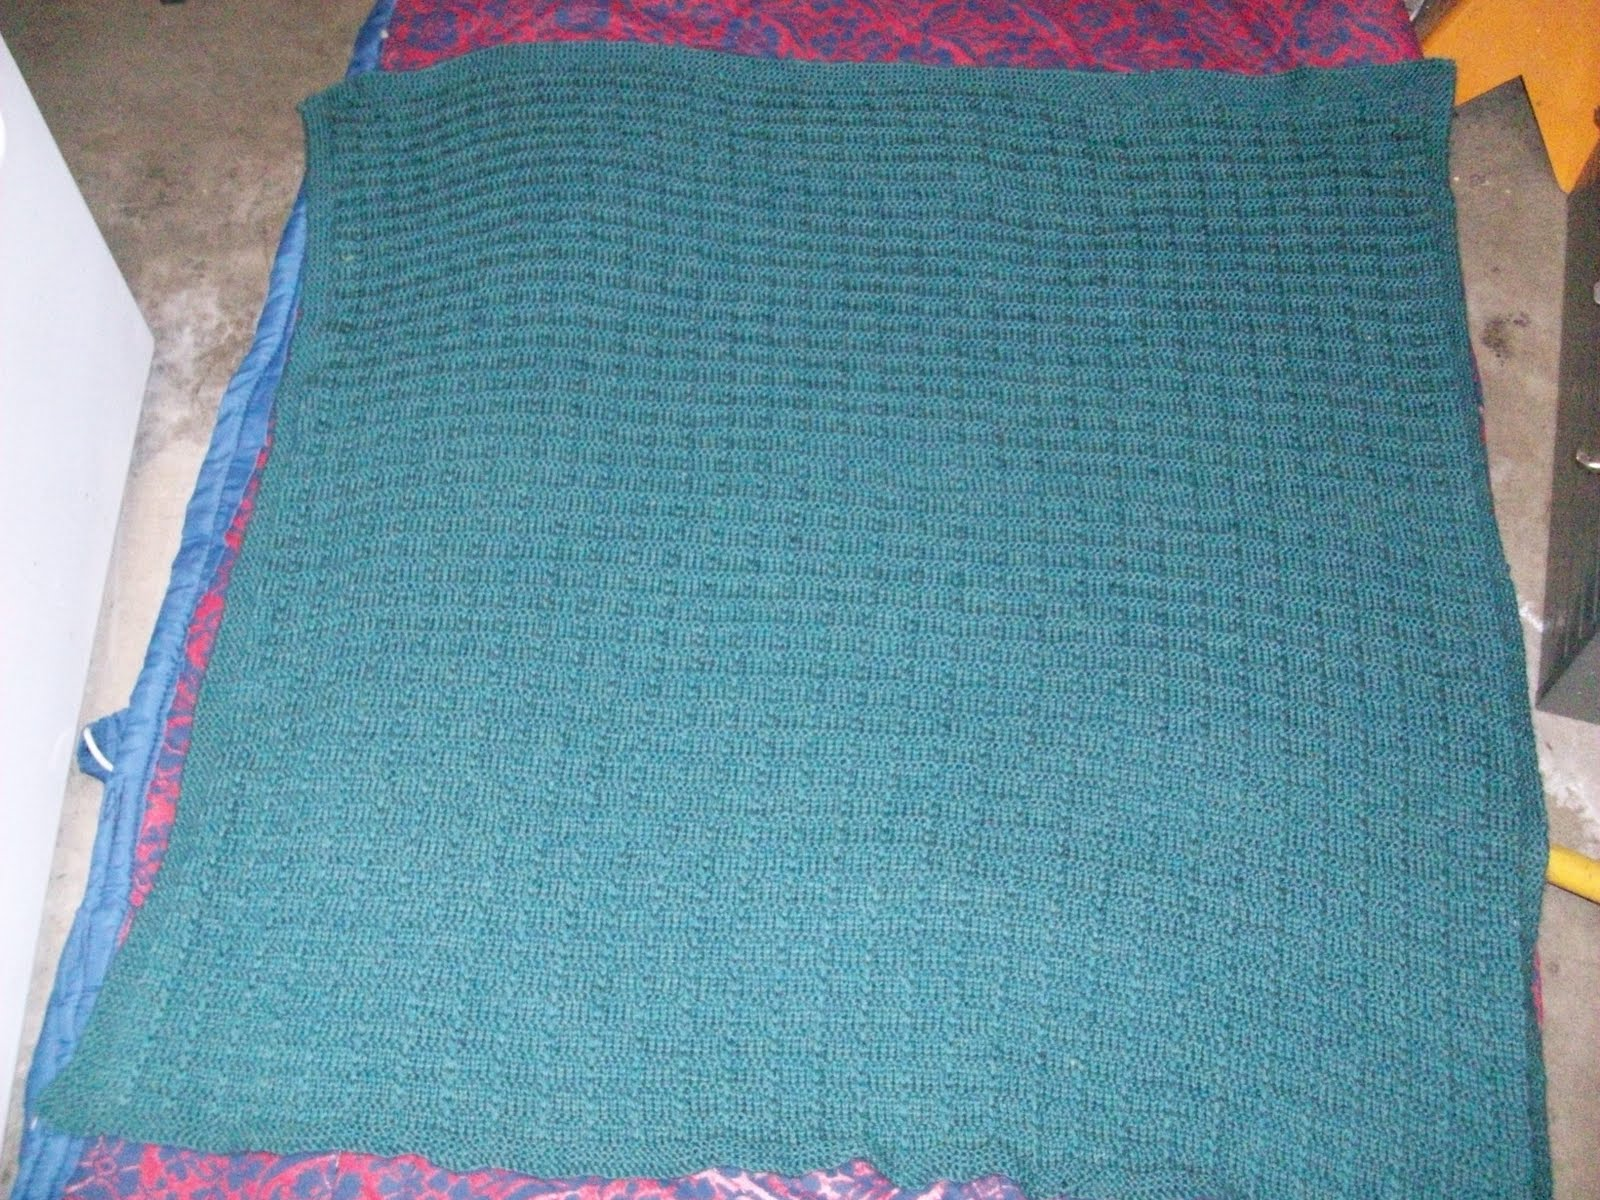 Waffle Knitting Pattern Blanket : Karens Knitting: Waffle stitch baby blanket